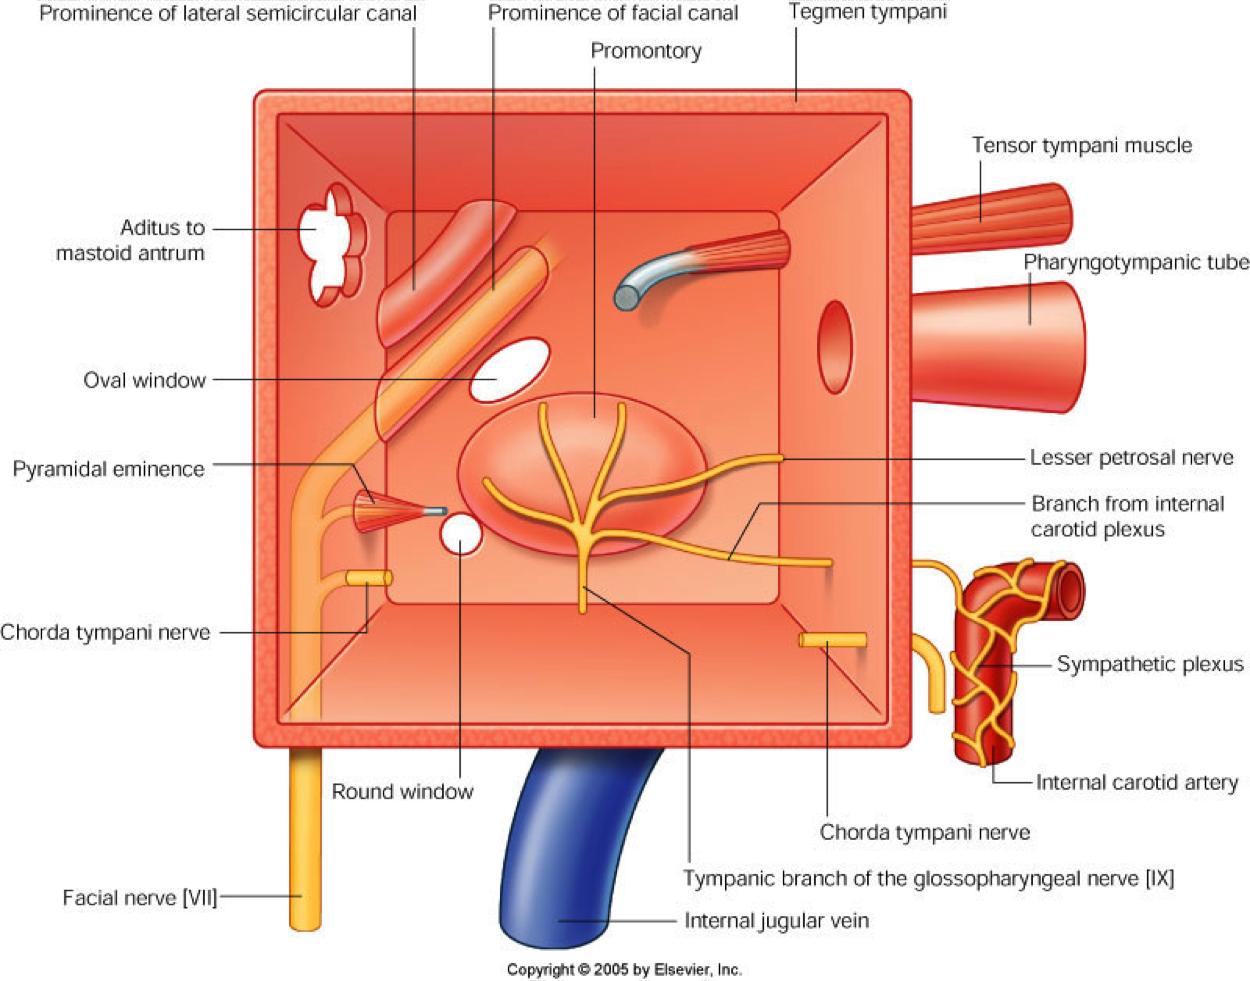 walls tympanic cavity - Cerca con Google | Anatomy | Pinterest